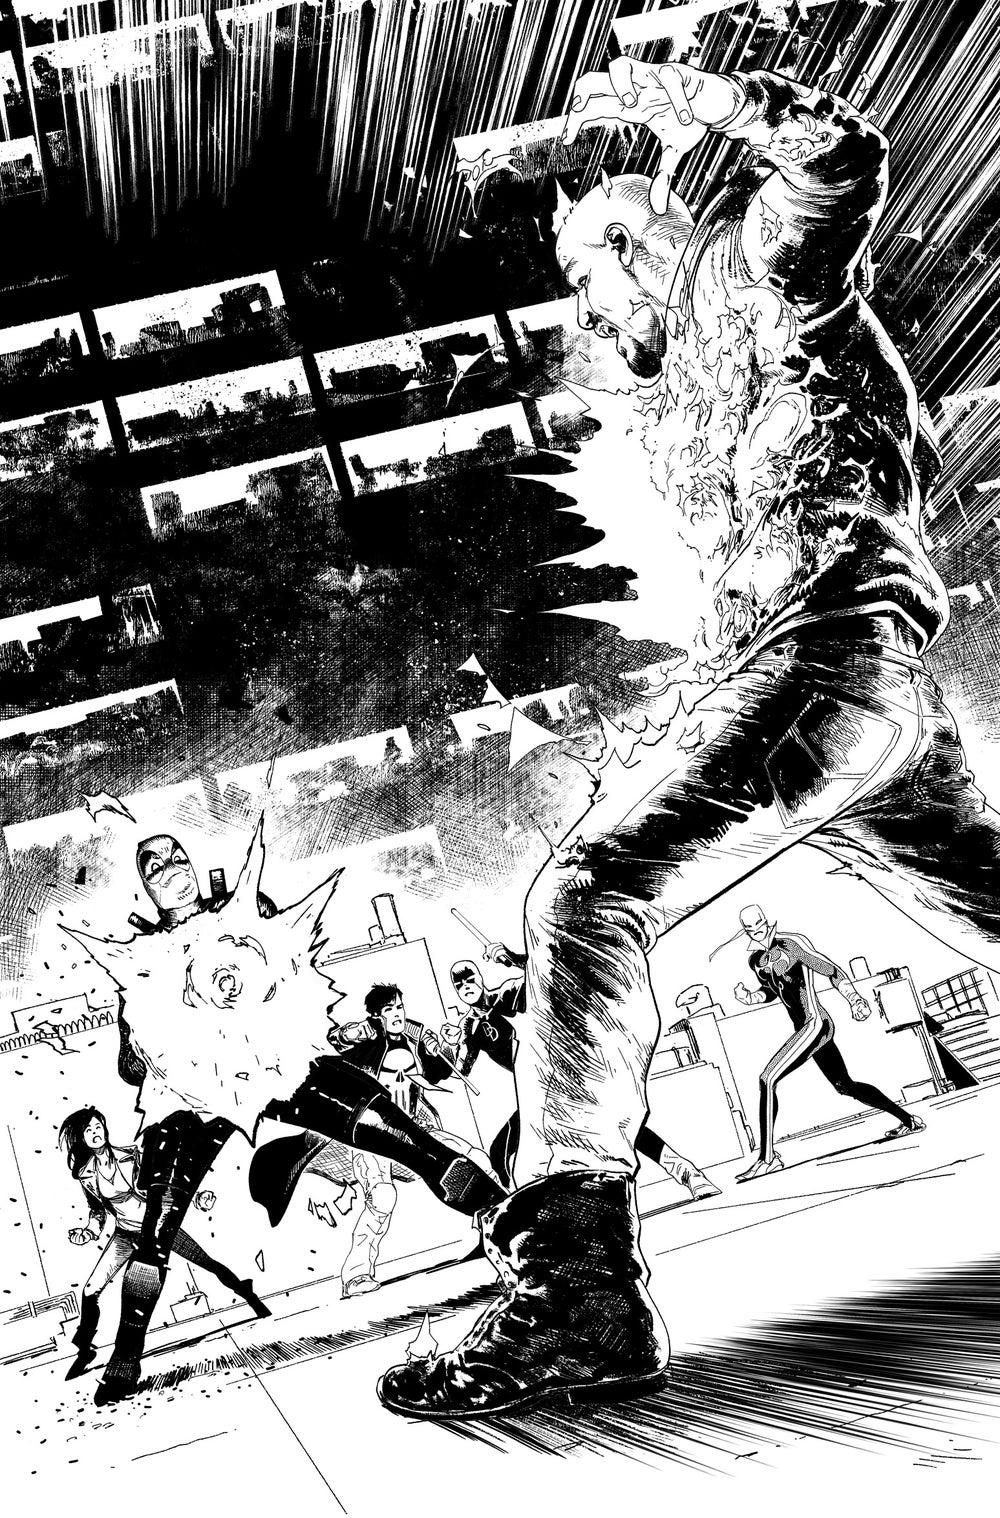 Image of DEFENDERS #8, p.13 ARTIST'S PROOF